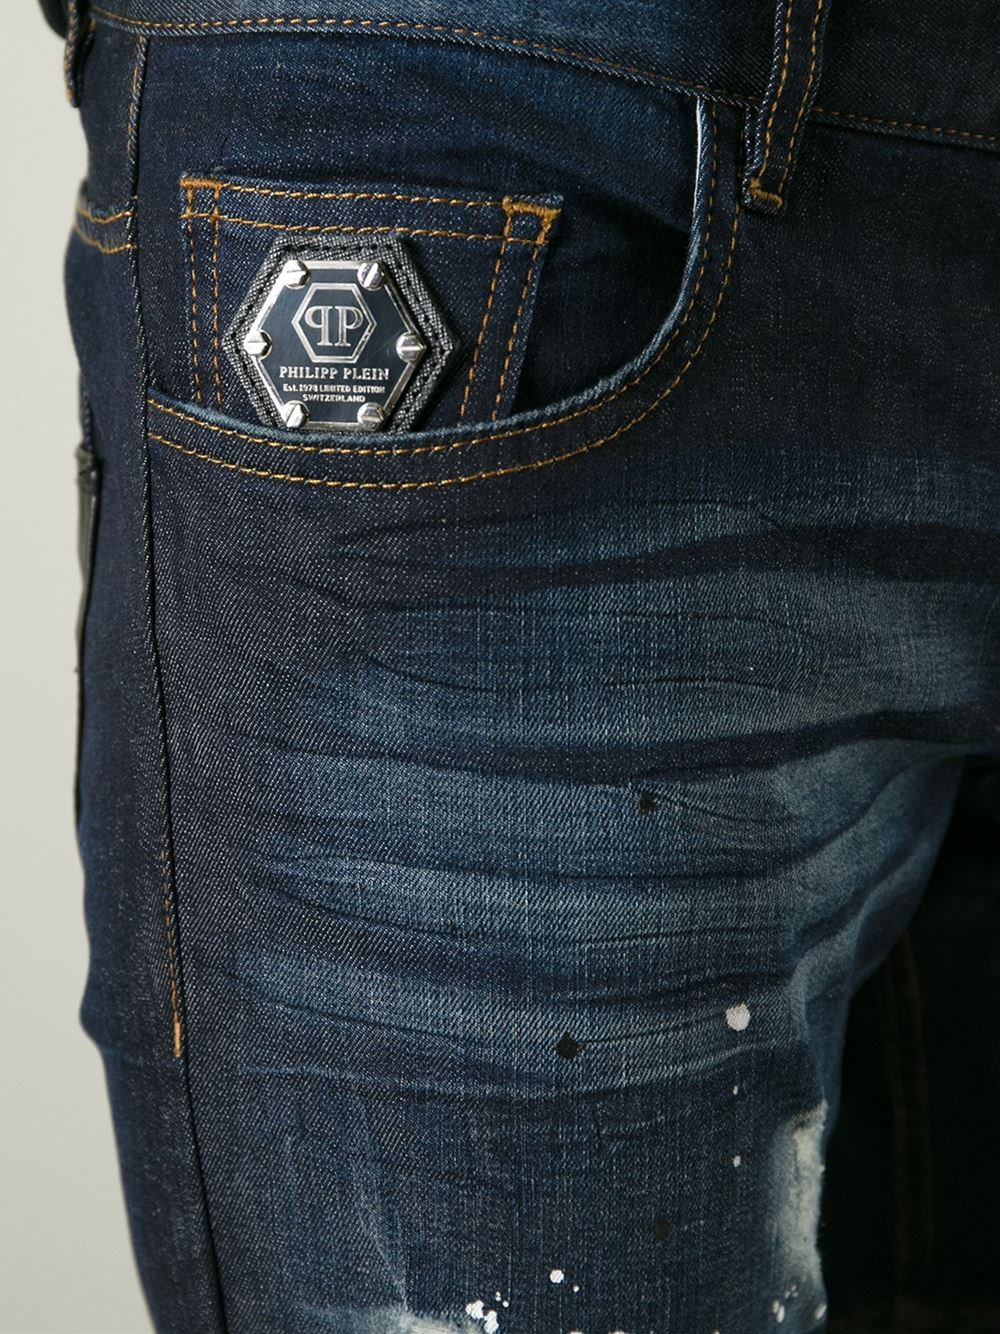 philipp plein 39 gone 39 jeans shive magazine. Black Bedroom Furniture Sets. Home Design Ideas